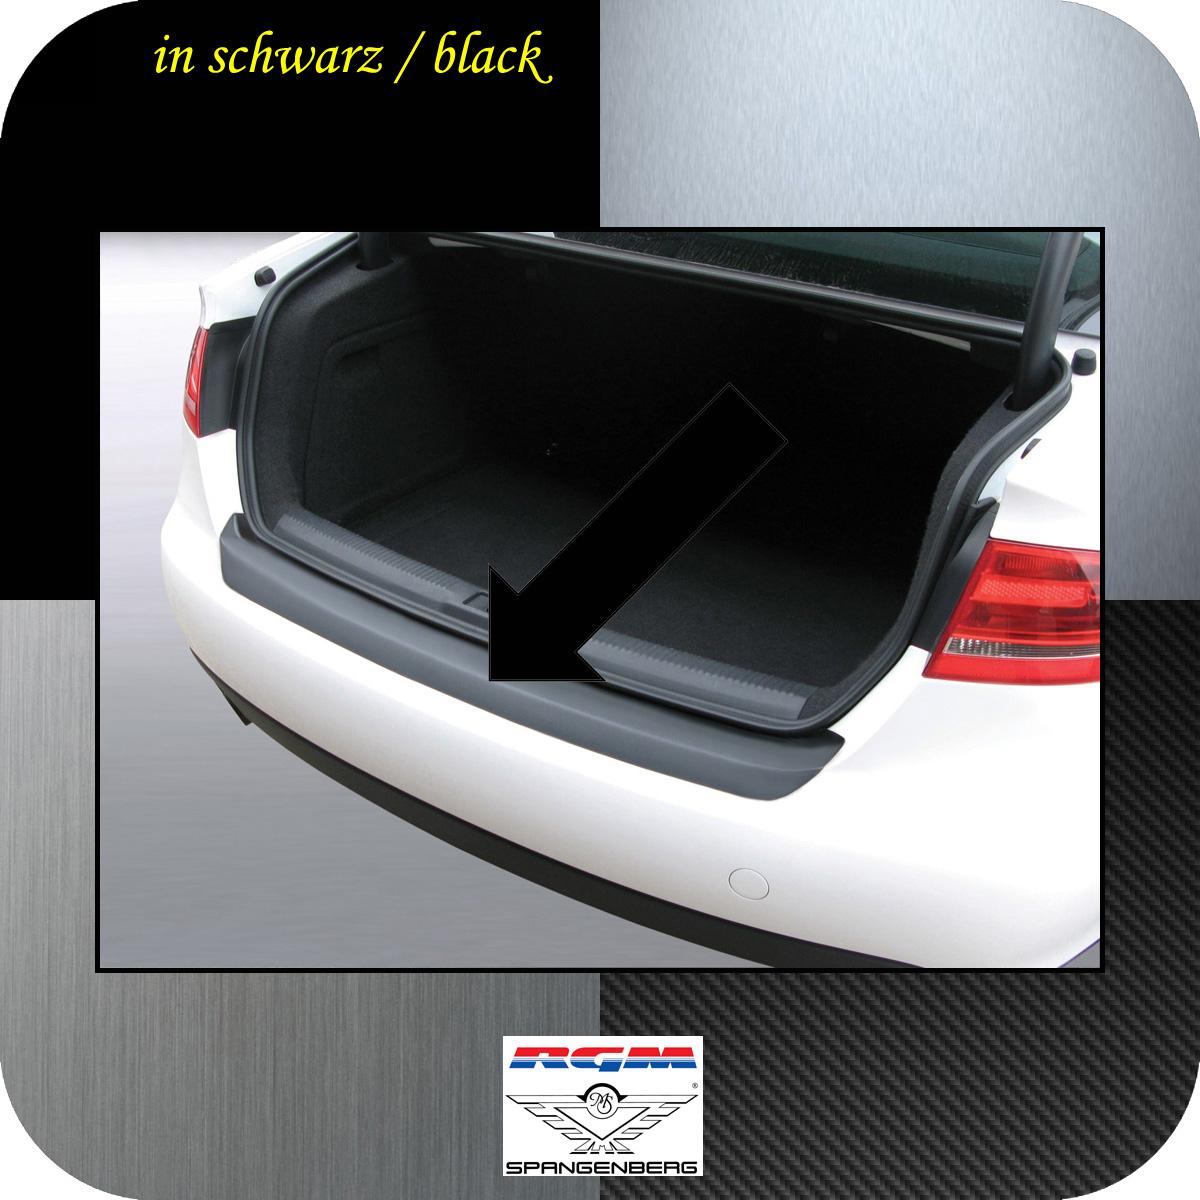 Ladekantenschutz schwarz Audi A4 B8 Limousine vor facelift 2007-11 3500158